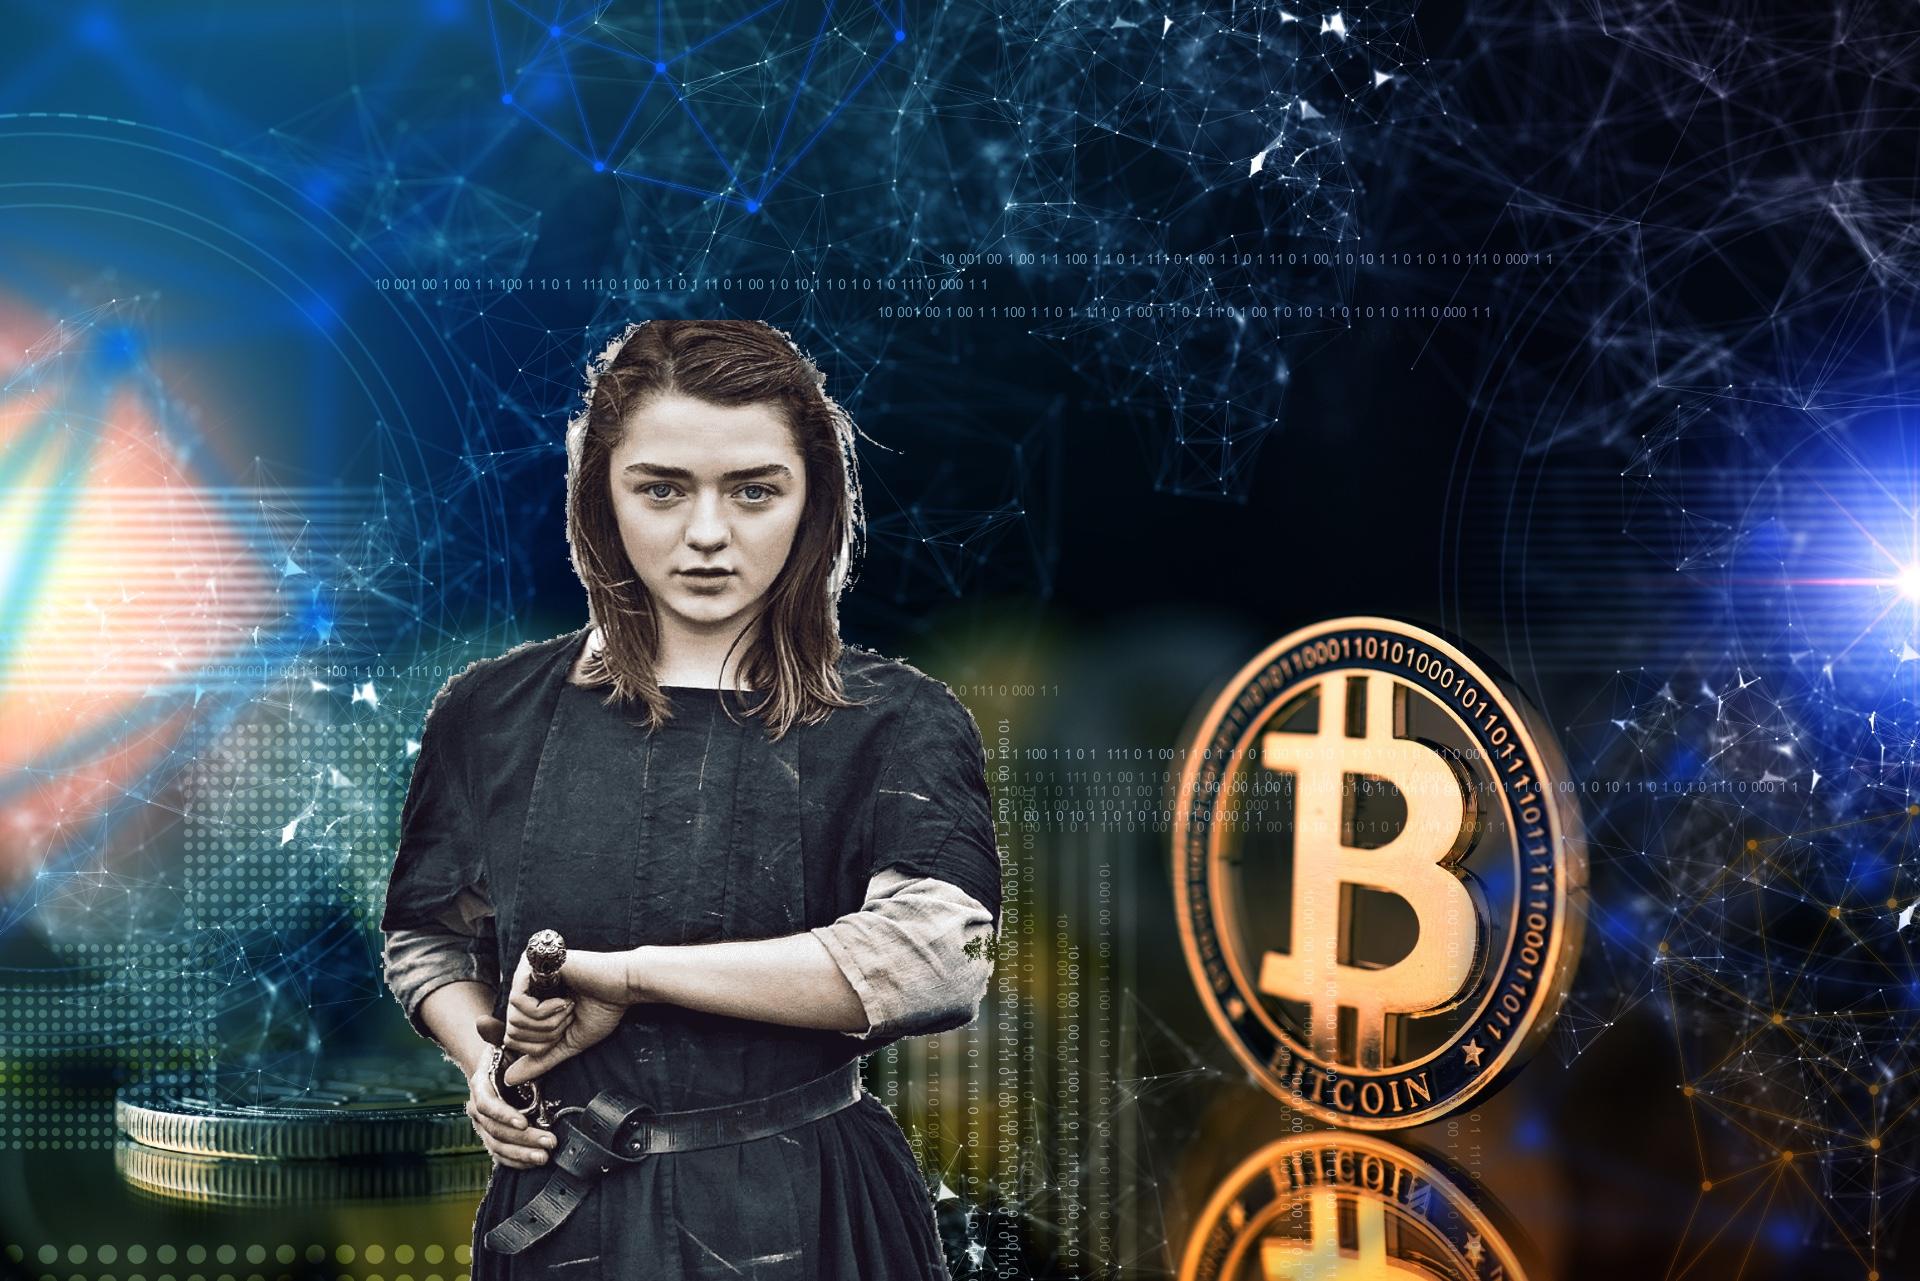 bitcoin arya stark game of thrones btc